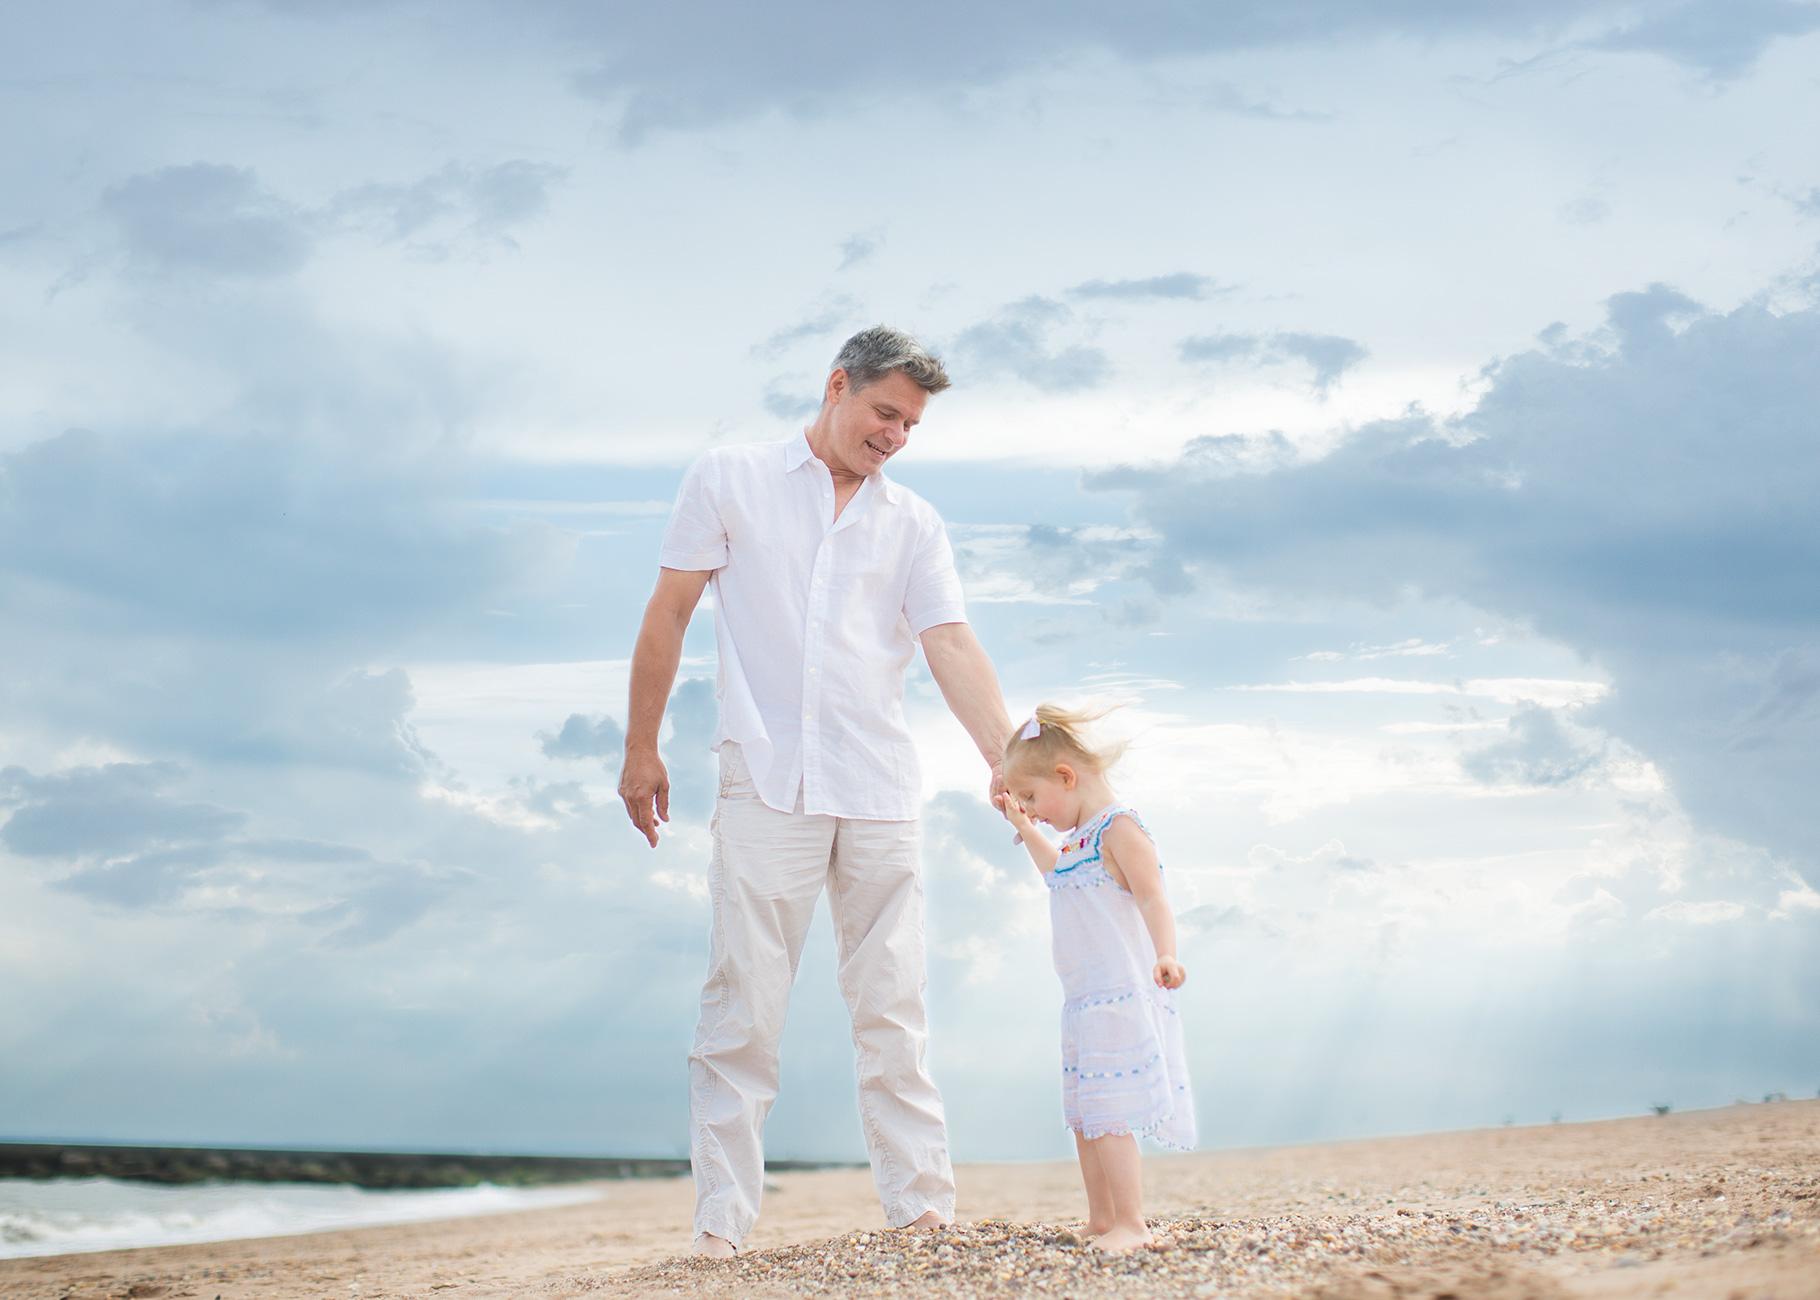 Man at the beach holding girls hand